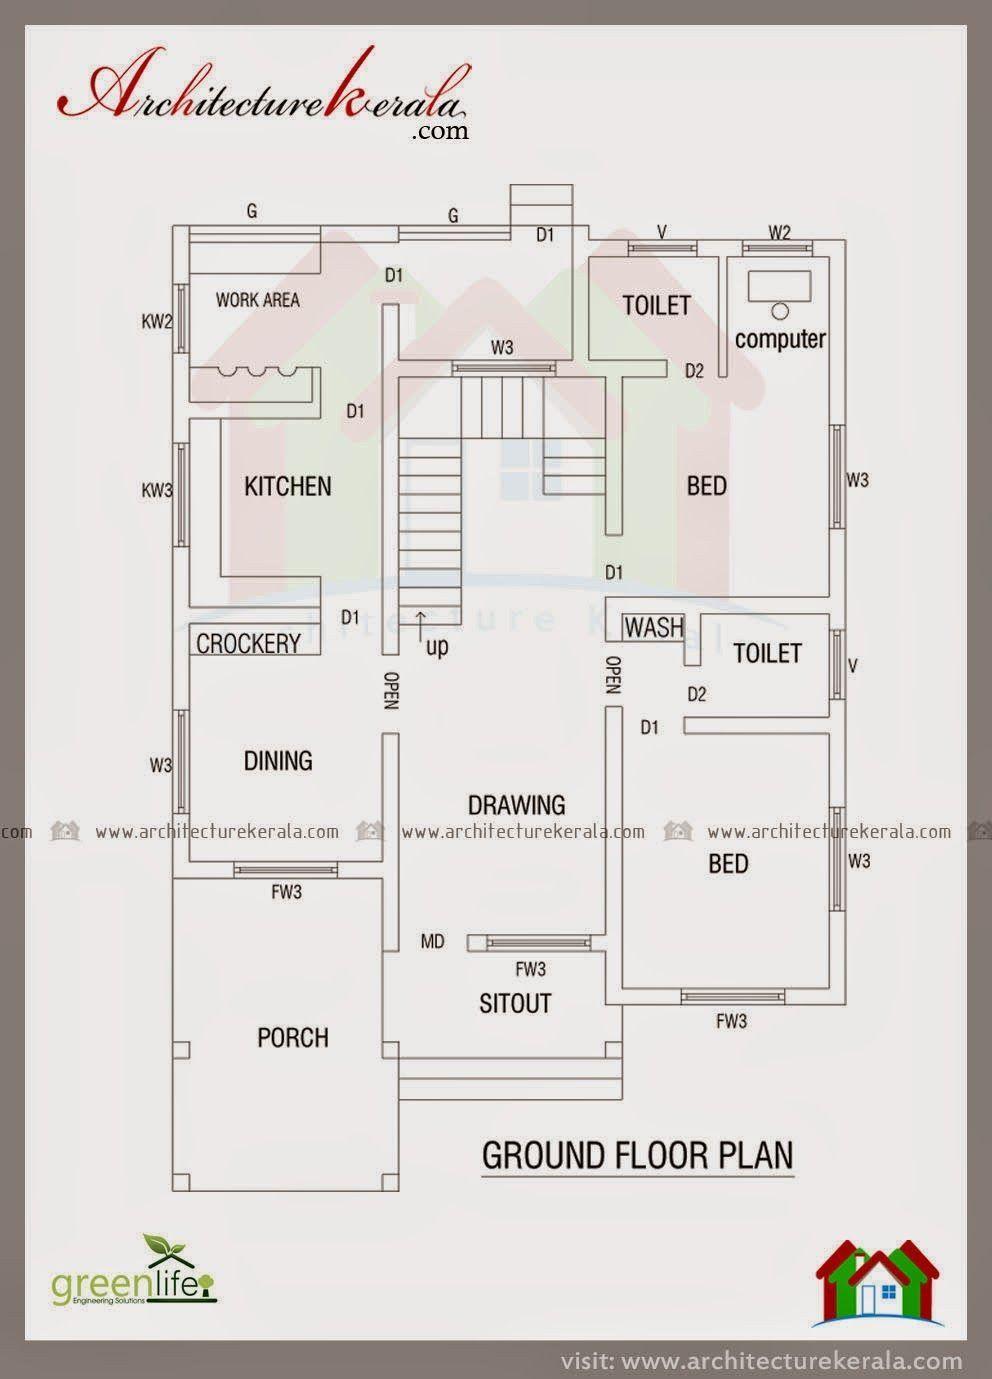 60x30 House 4 Bedroom 3 Bath 1800 Sq Ft Pdf Floor Etsy Pole Barn House Plans Metal House Plans House Projects Architecture